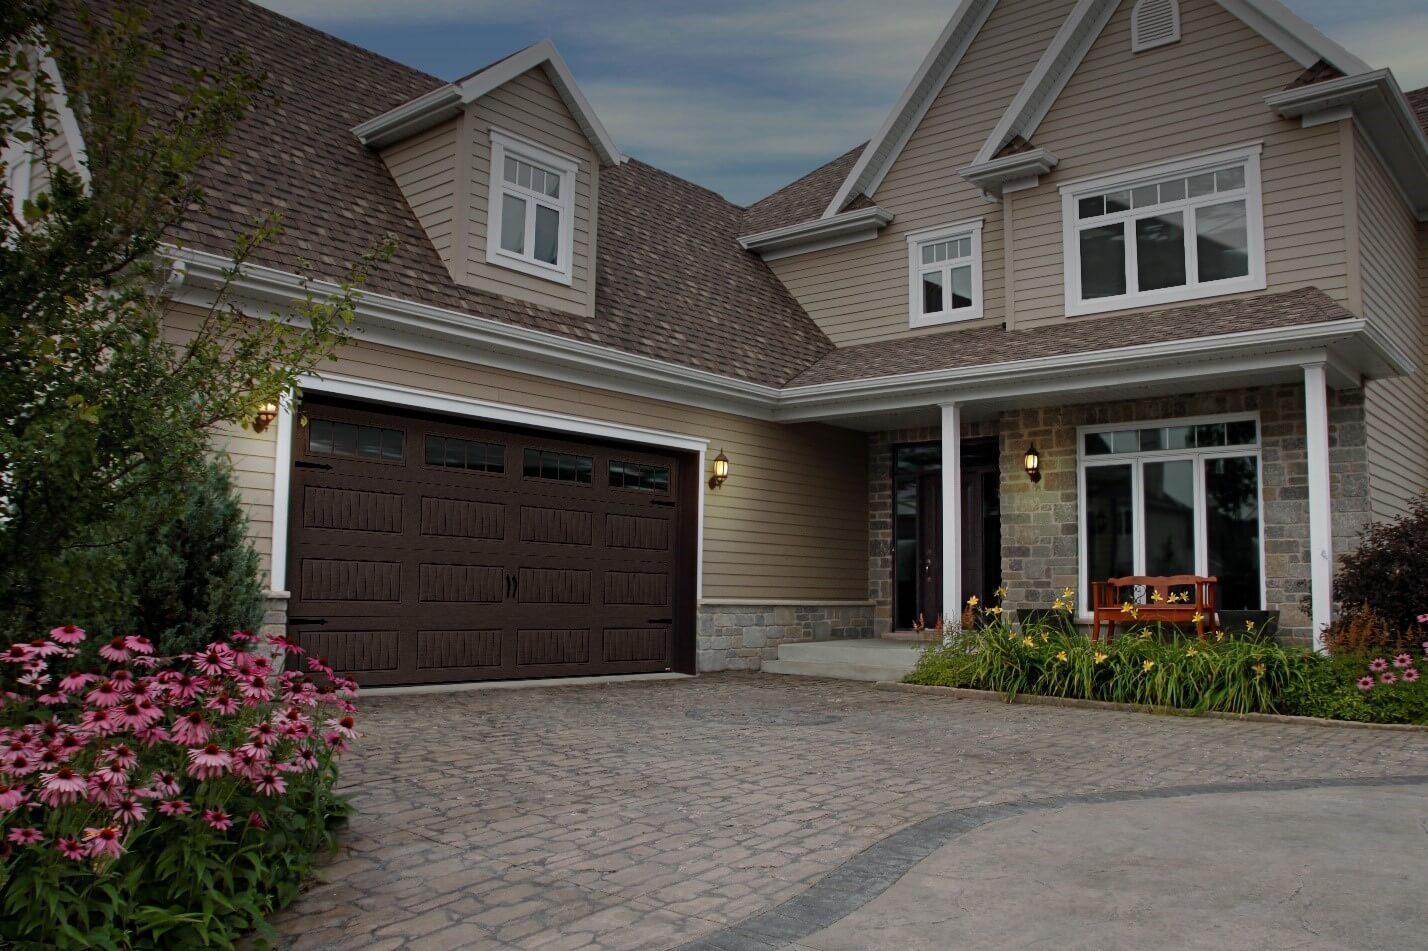 Traditional 2-stories house. Garage door is a North Hatley LP, 16' x 8', Moka Brown color, 4 vertical lite Orion windows